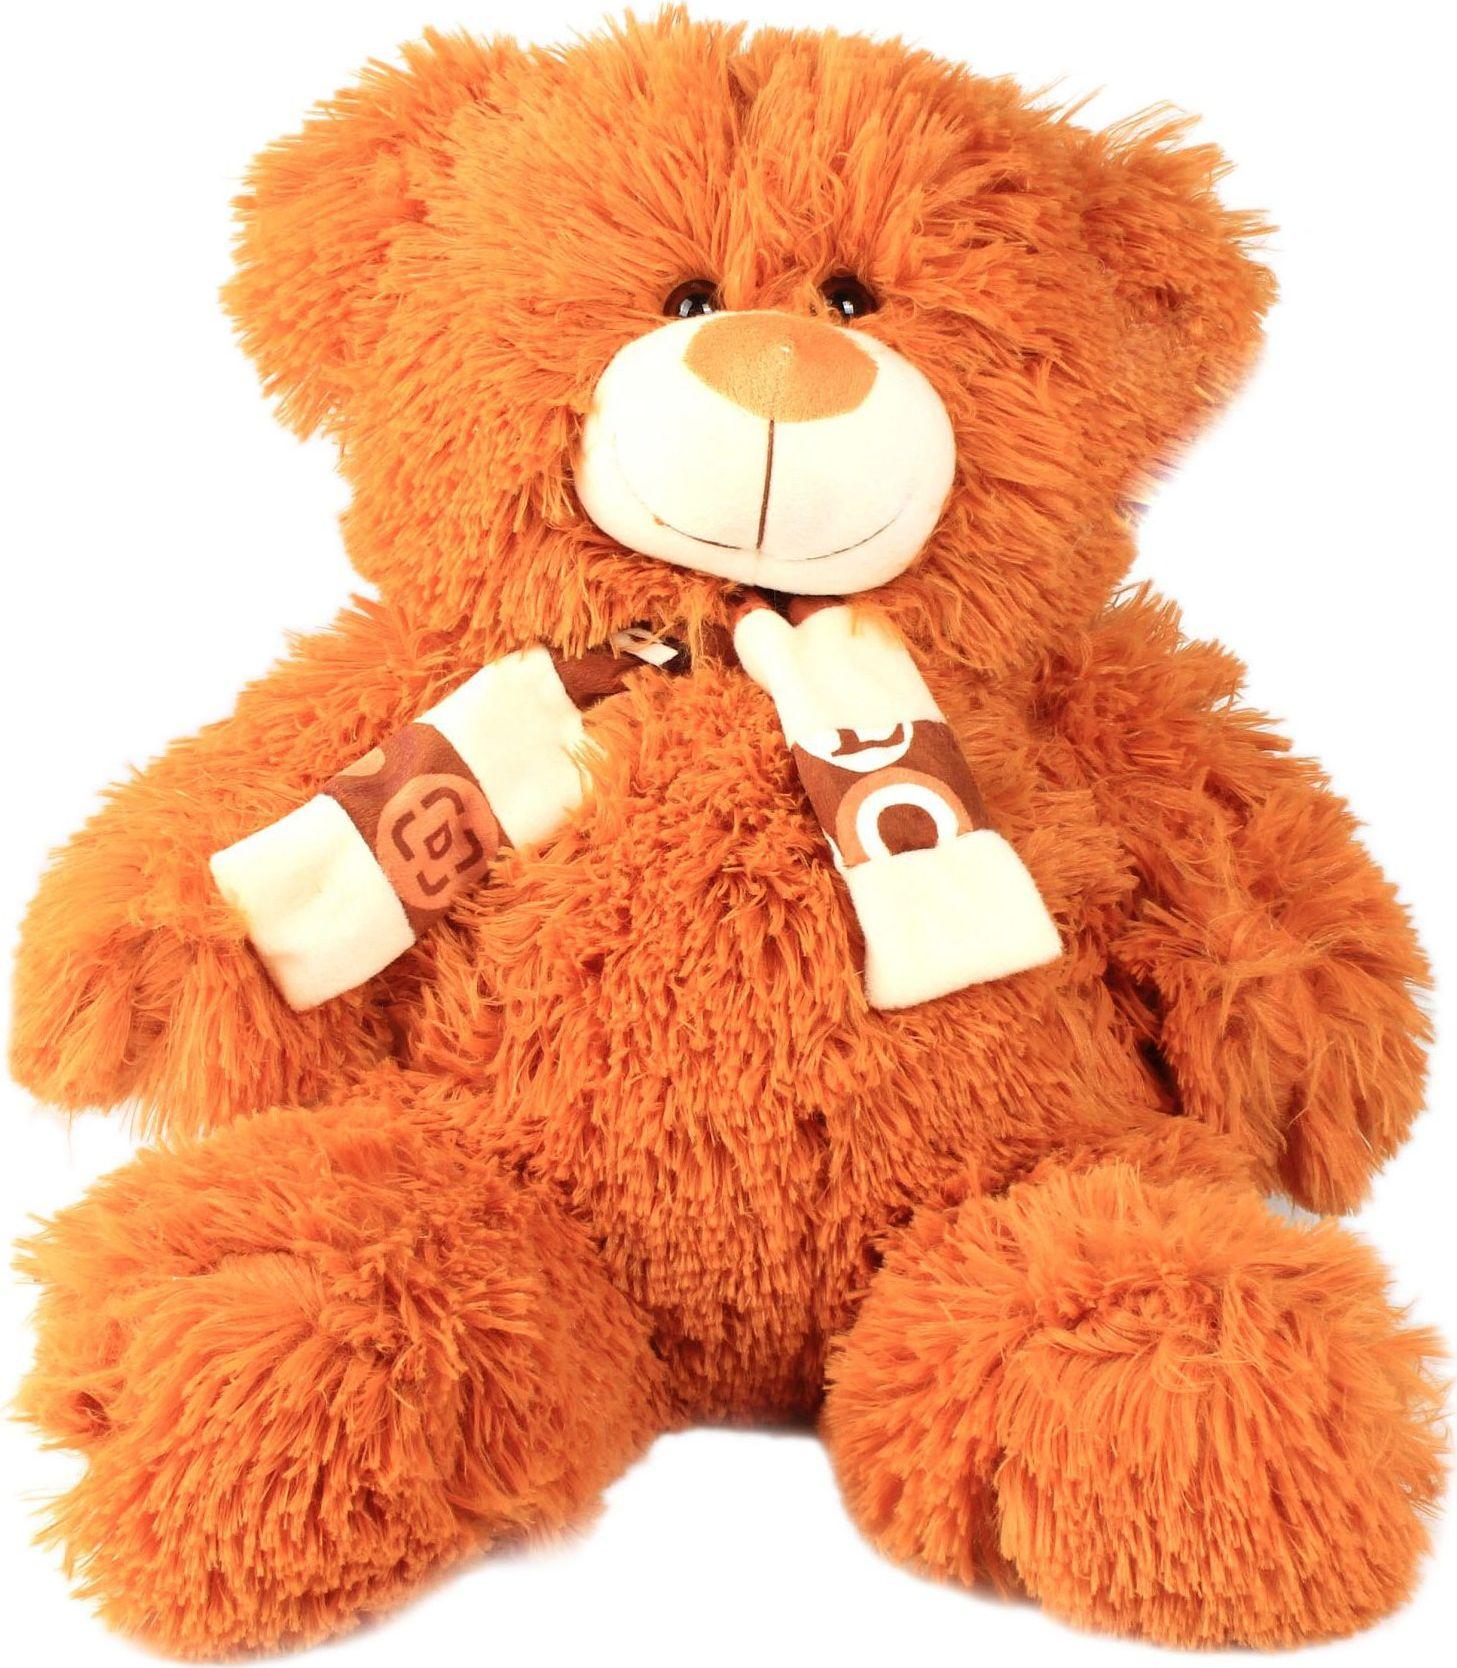 Sima-land Мягкая игрушка Мишка в шарфе лохматый sima land мягкая игрушка на руку мальчик 1147835